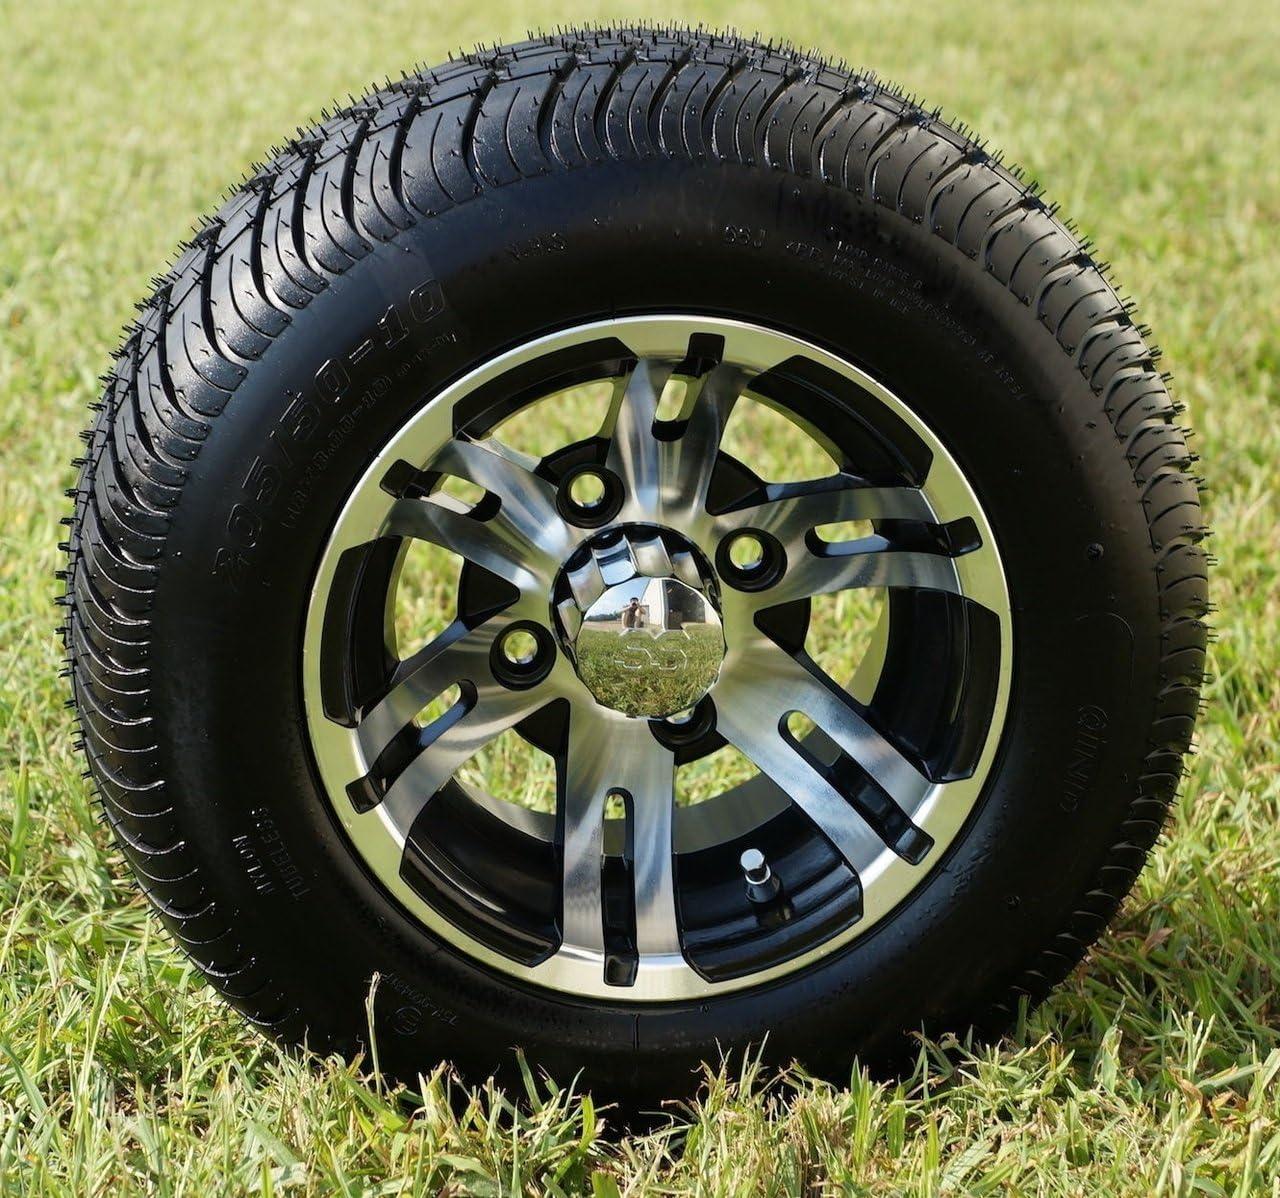 "10"" BULLDOG Machined Golf Cart Wheels and 205/50-10 DOT Golf Cart Tires Combo - Set of 4"